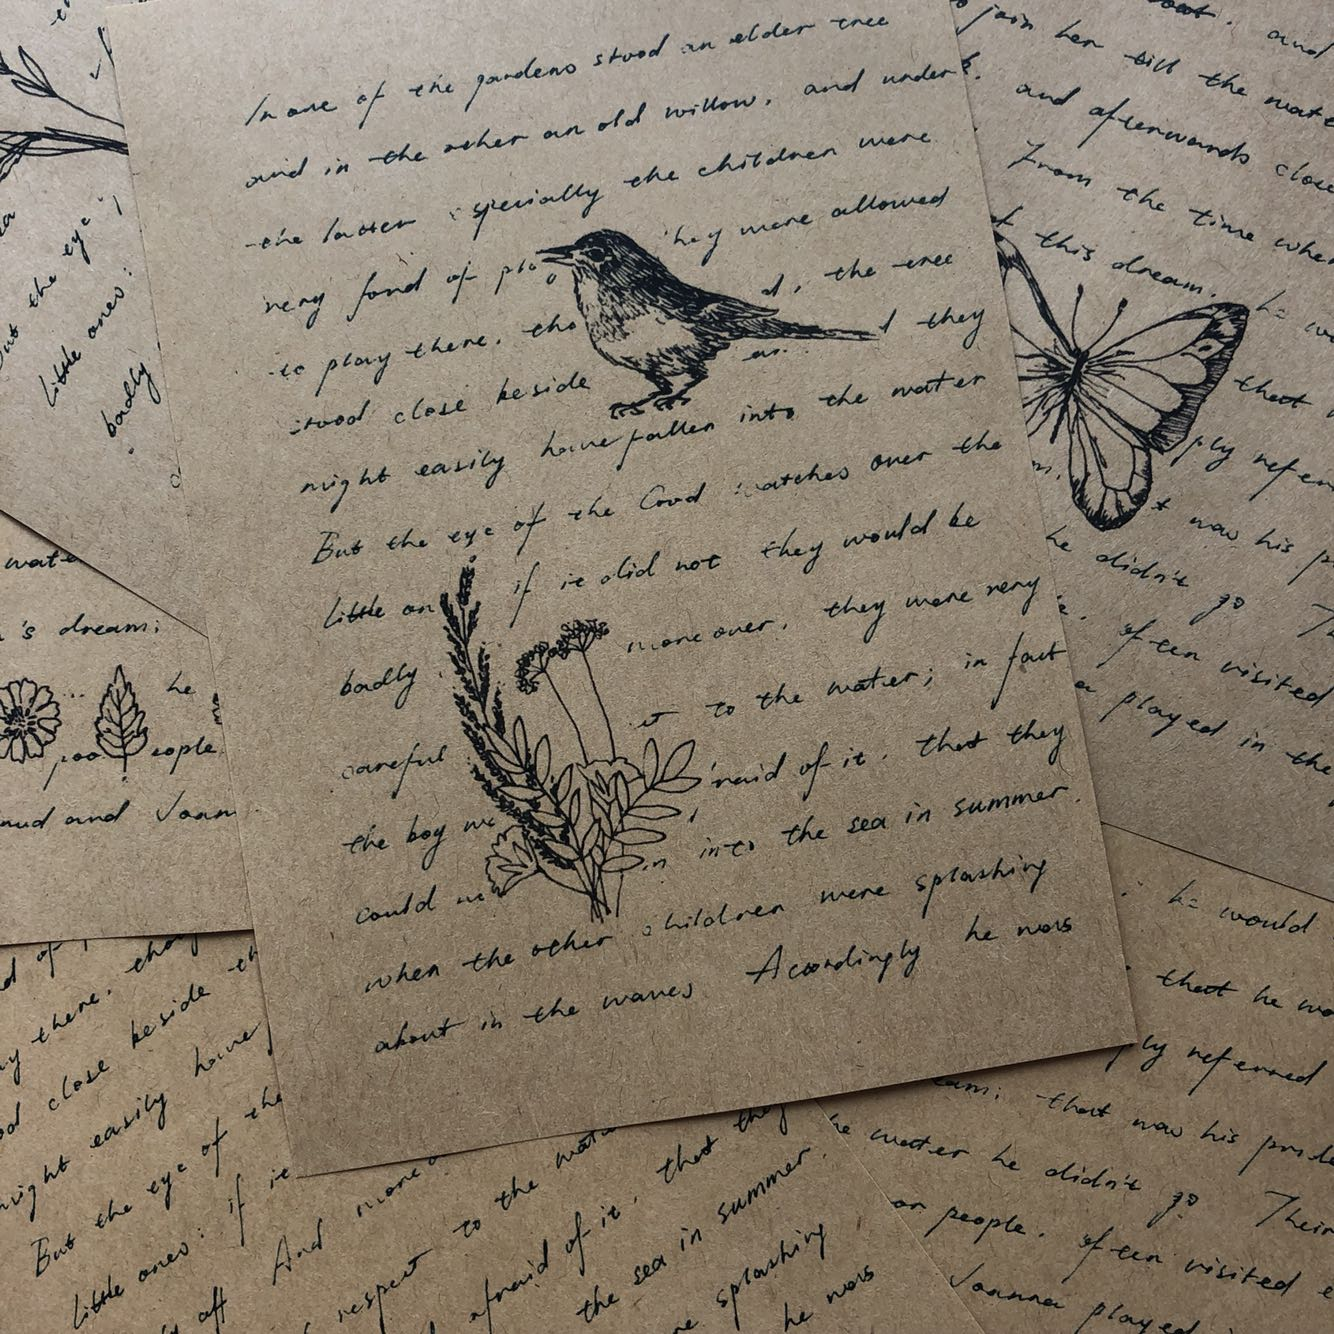 6 Pcs\set Retro English Kraft Paper Vintage Plant Junk Material Paper Set For Scrapbooking Happy Planner/Card Making/Journaling